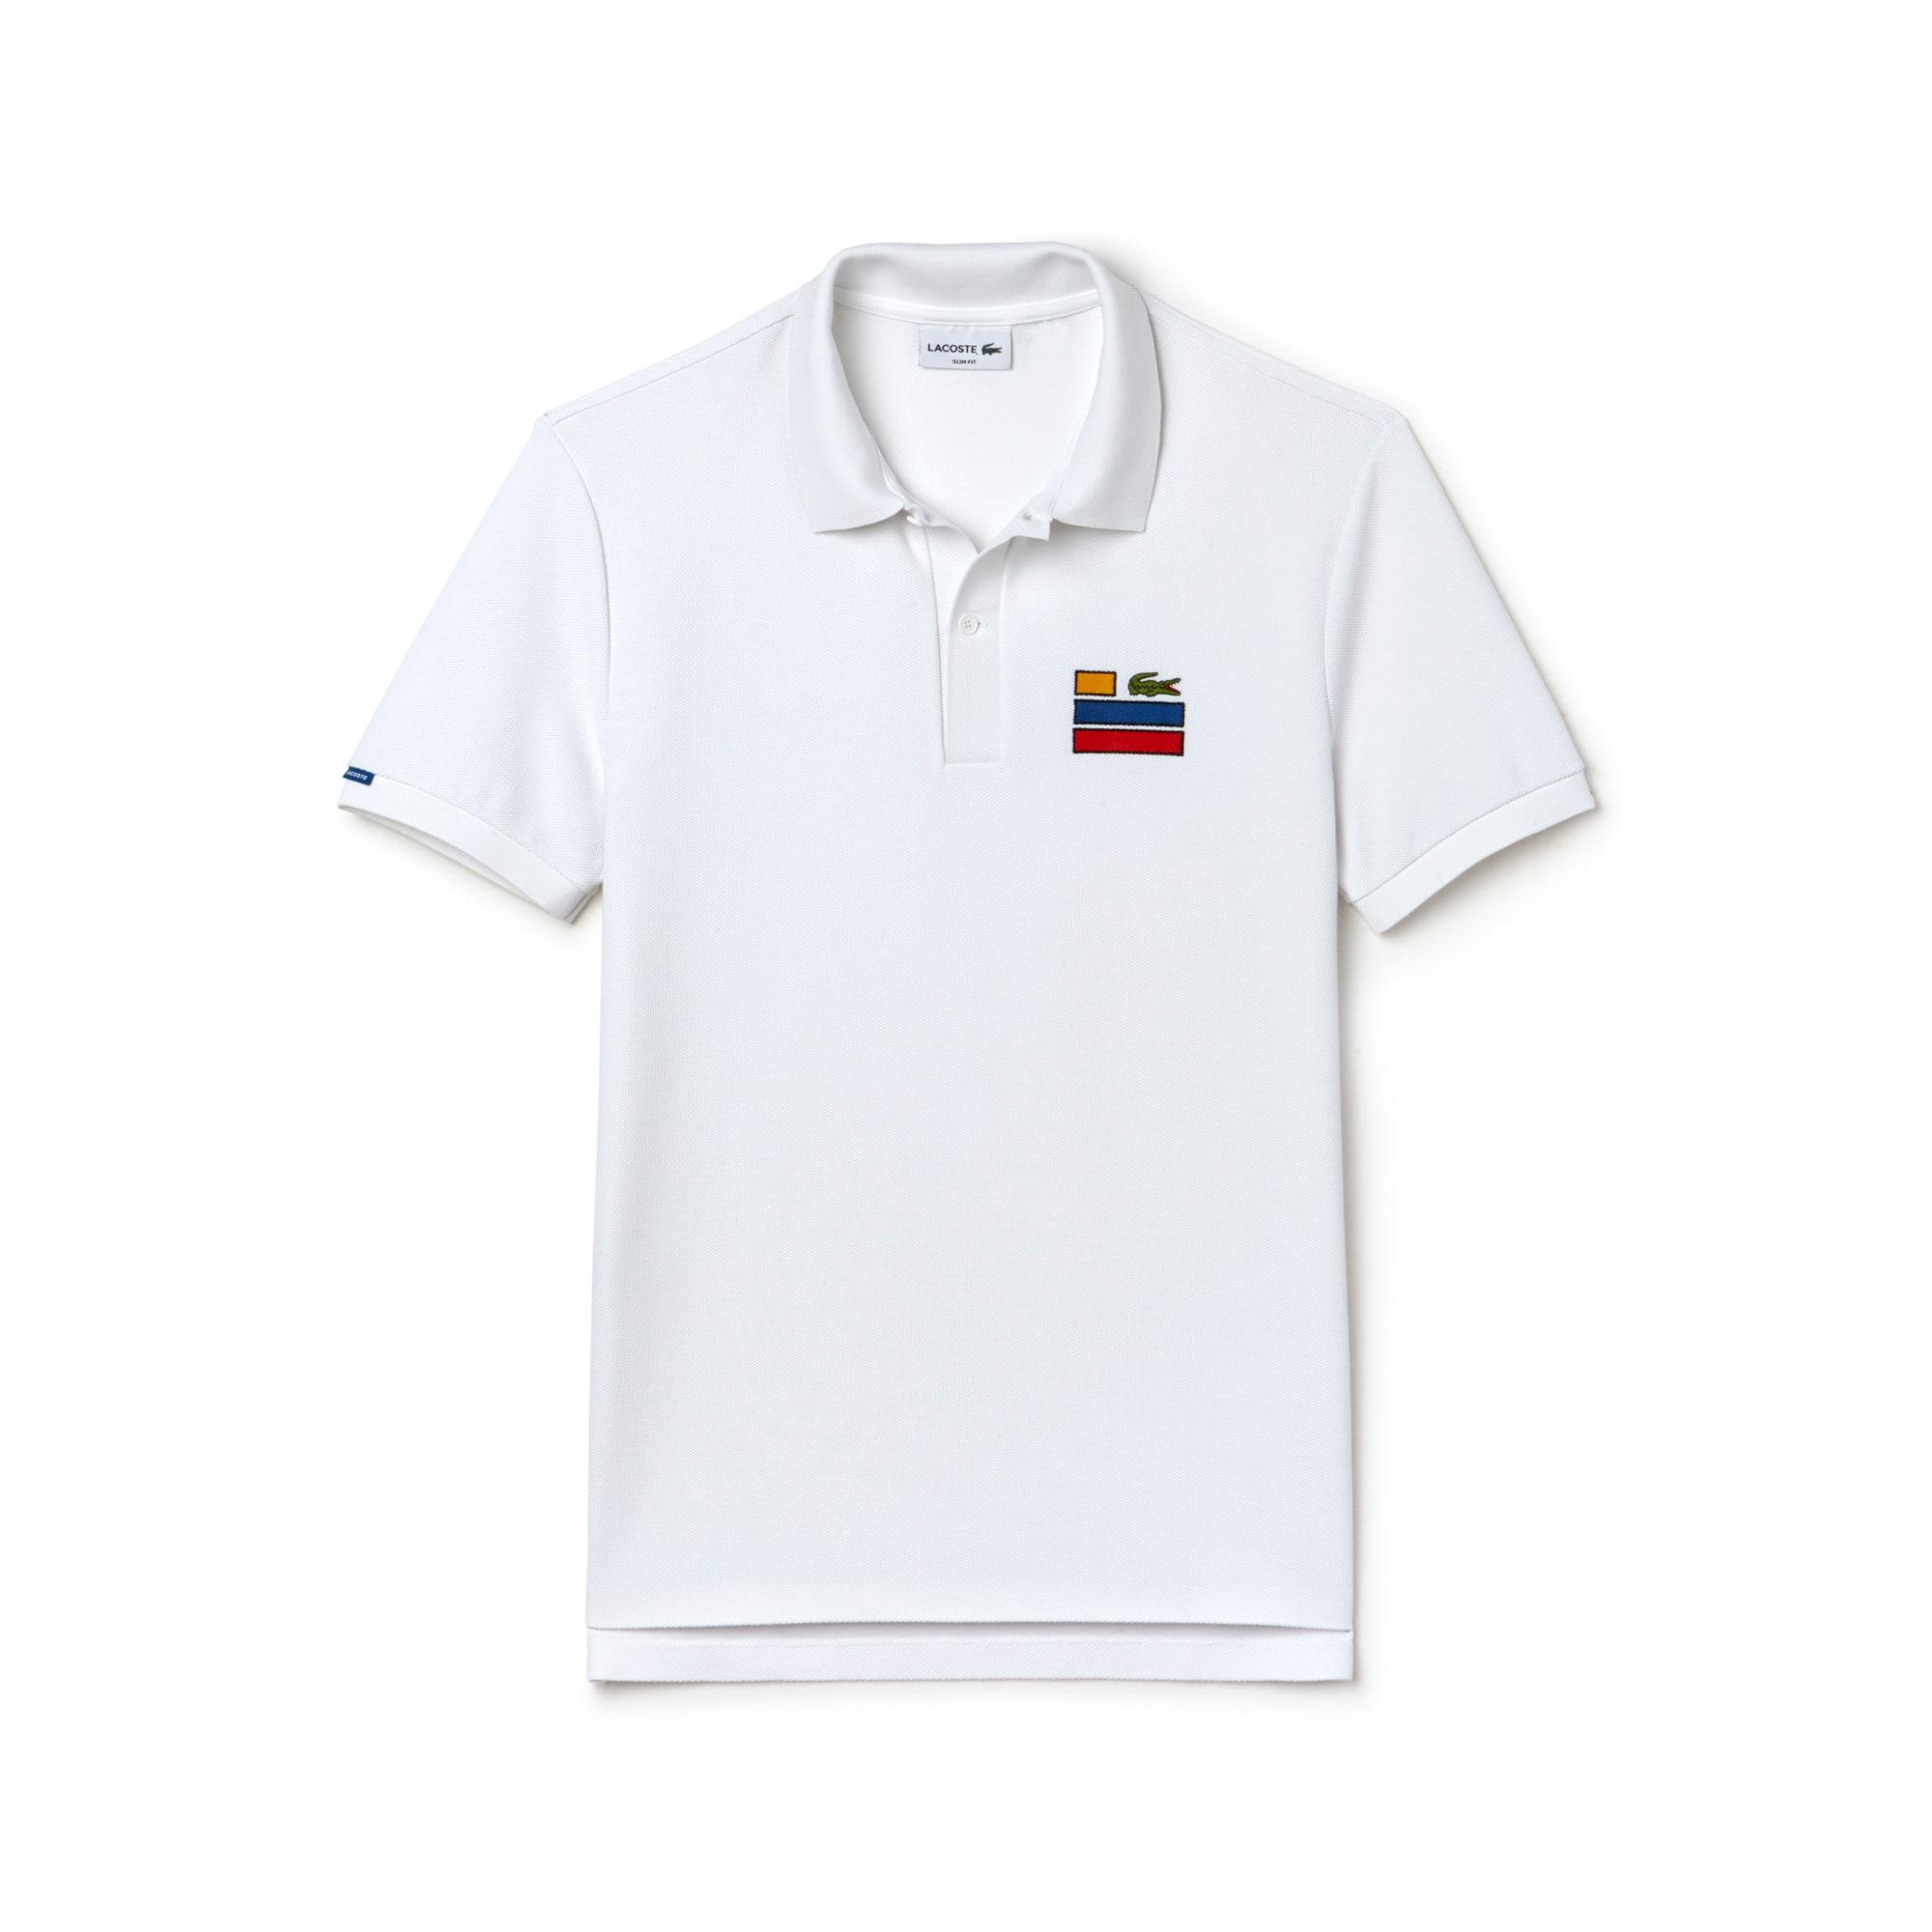 Men's Slim Fit Piqué Chest Embroidery Polo Shirt